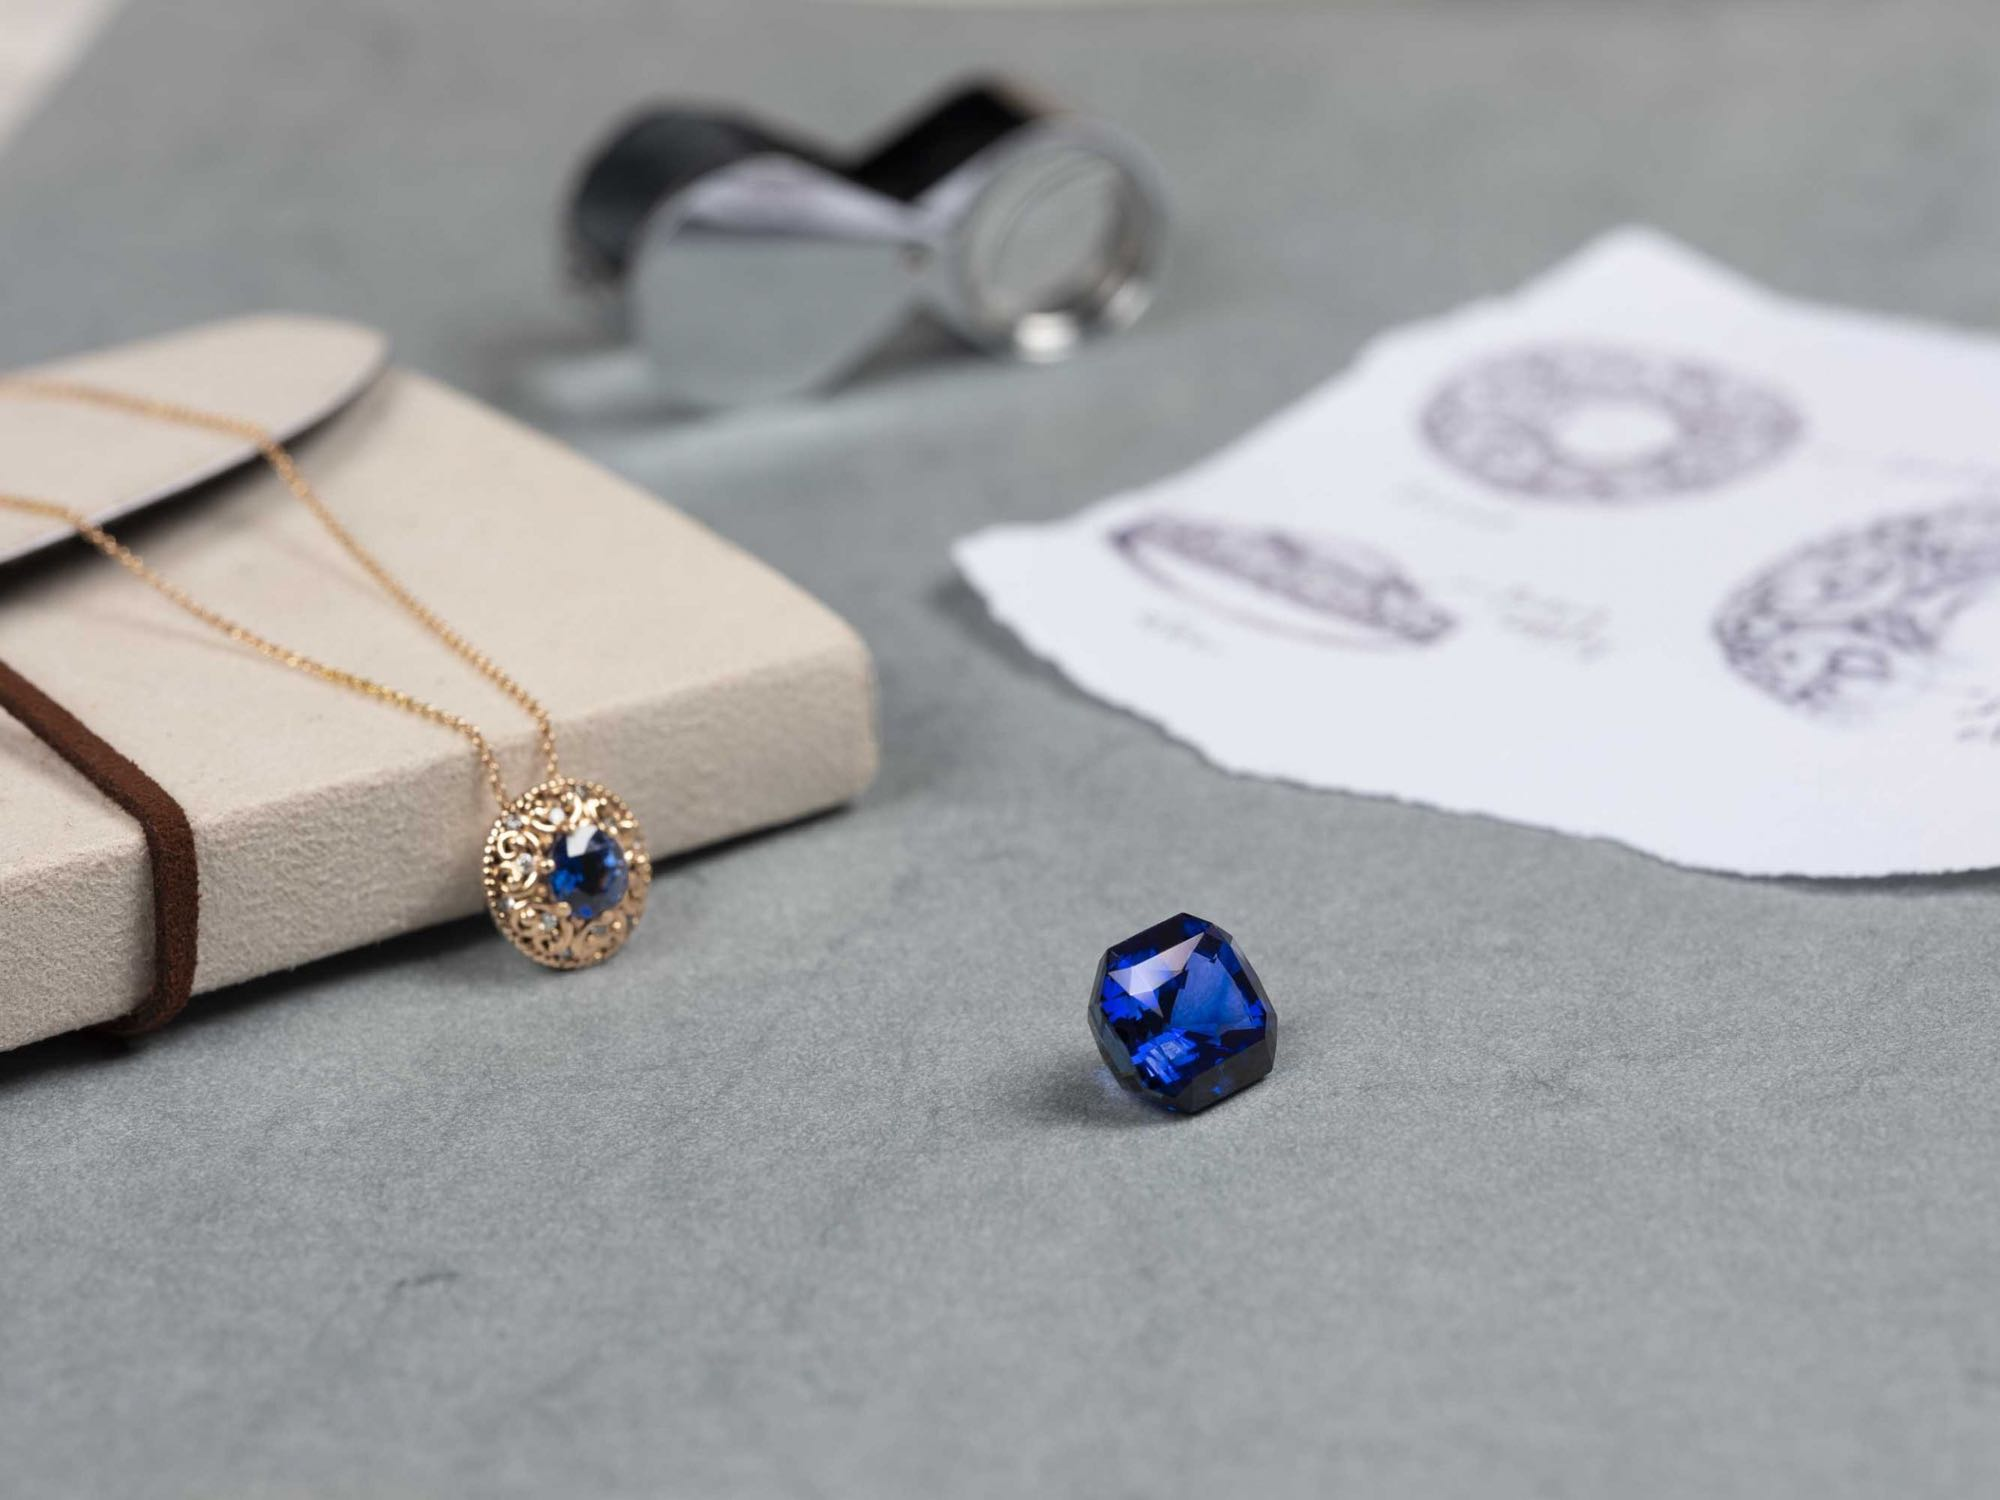 Jewellery Product Photography Singapore Jose Jeuland 6